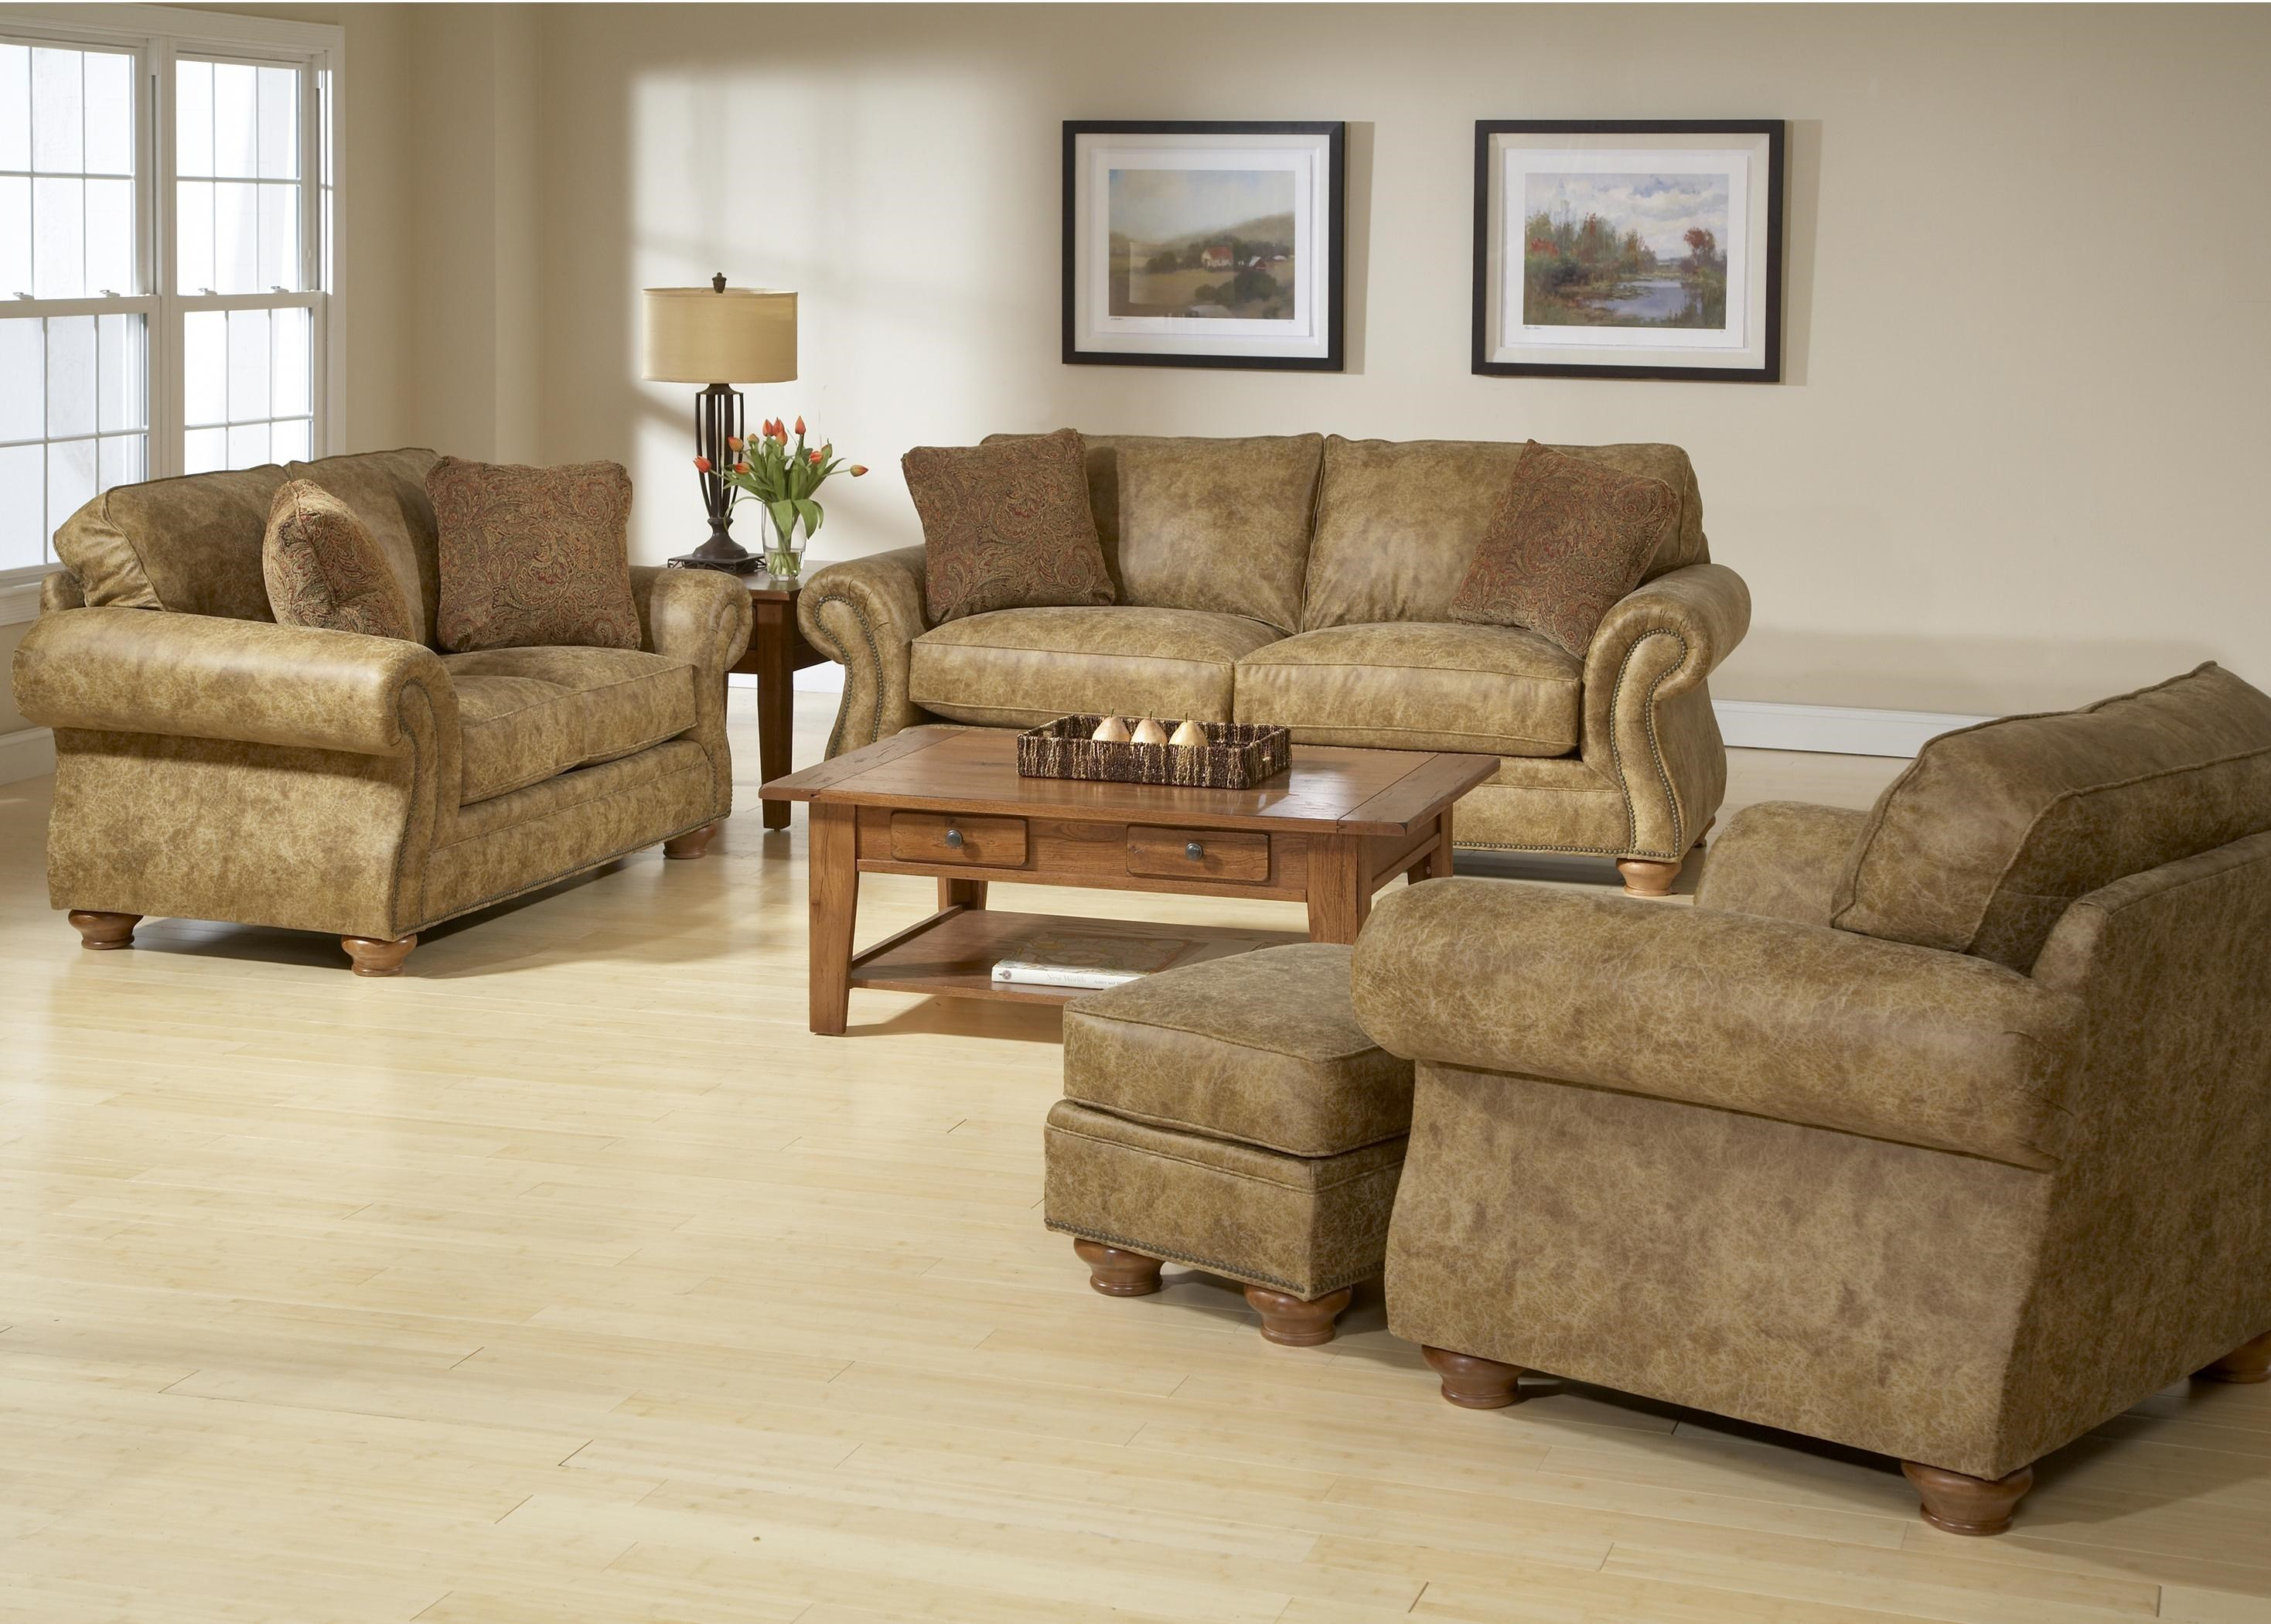 broyhill laramie sofa fabric apt size sofas furniture recliner